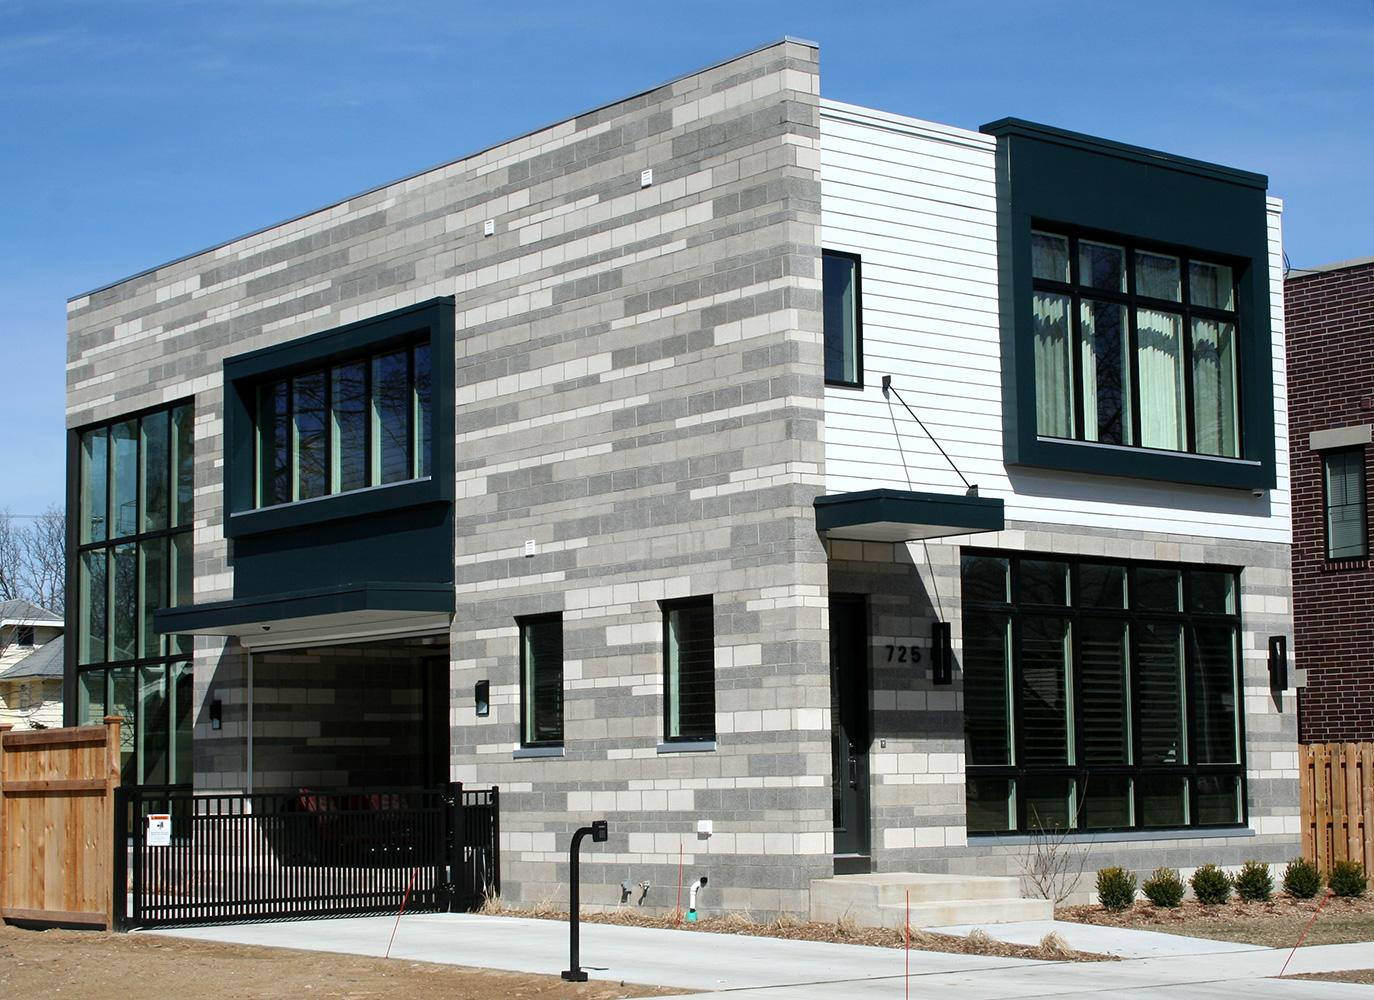 grand-rapids-michigan-certified-concrete-varigrind-gallery-1.jpg